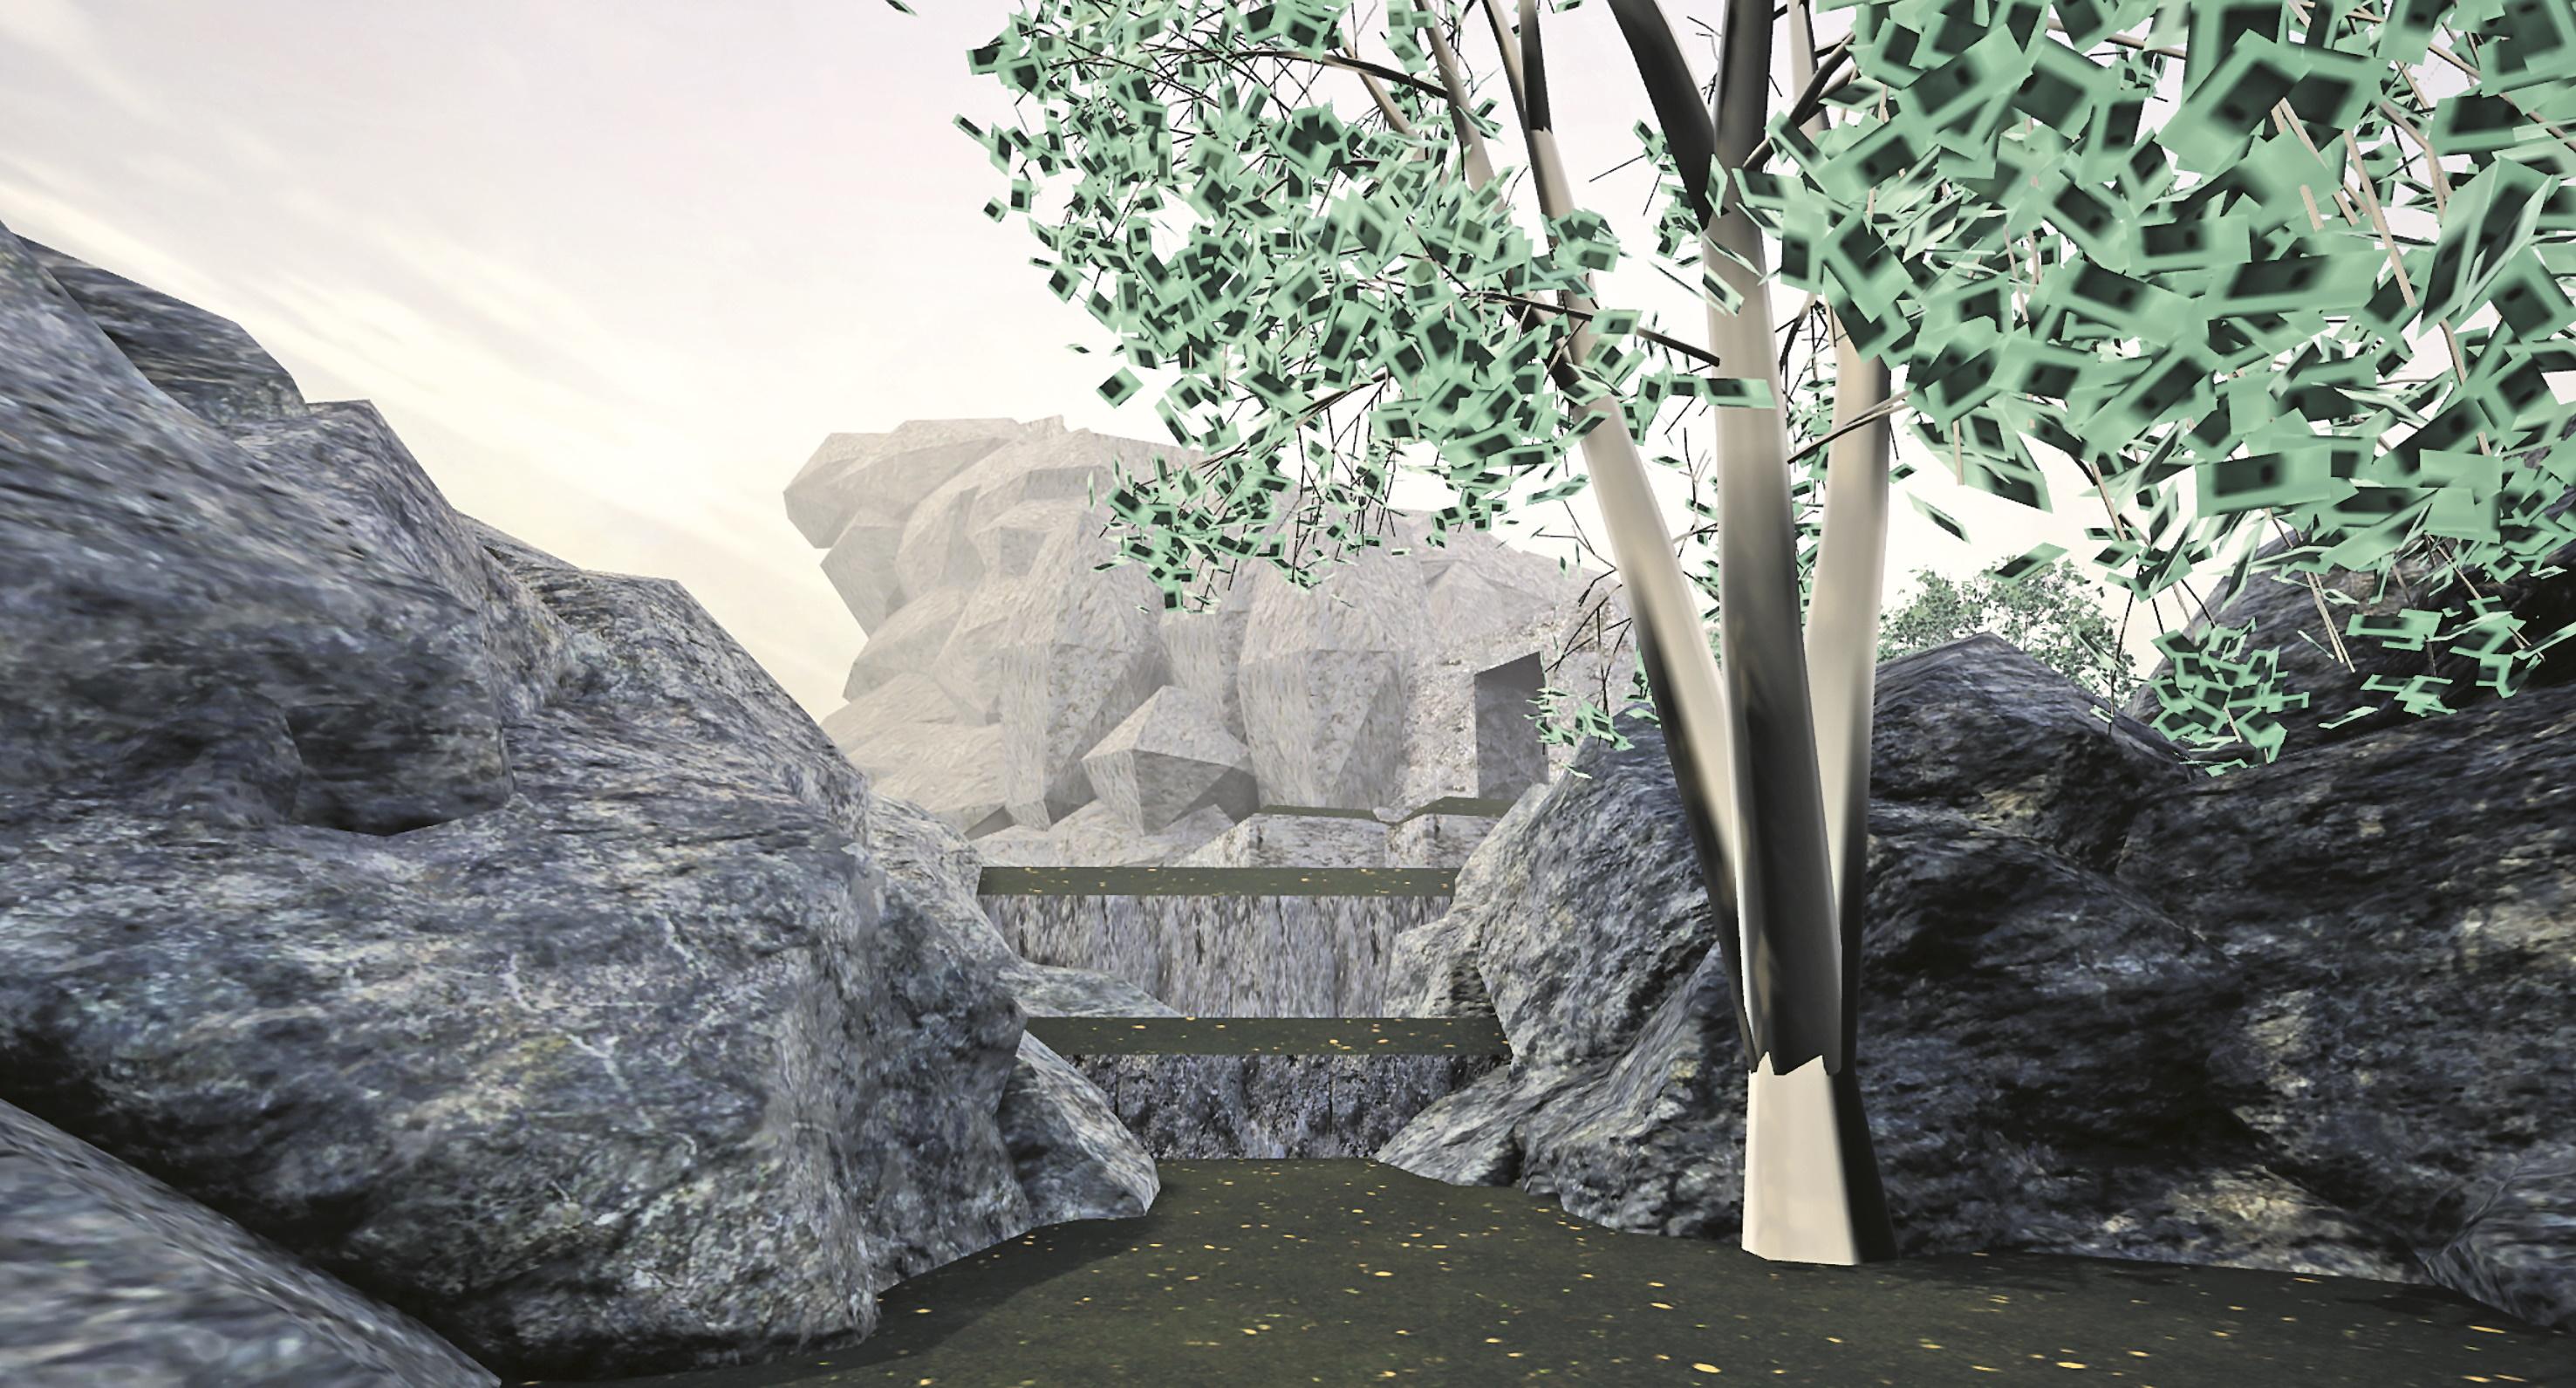 Abb. 3: 3D-Prototyp mit Ausnahme des Baums ausschließlich bestehend aus Unreals Geometry Brushes